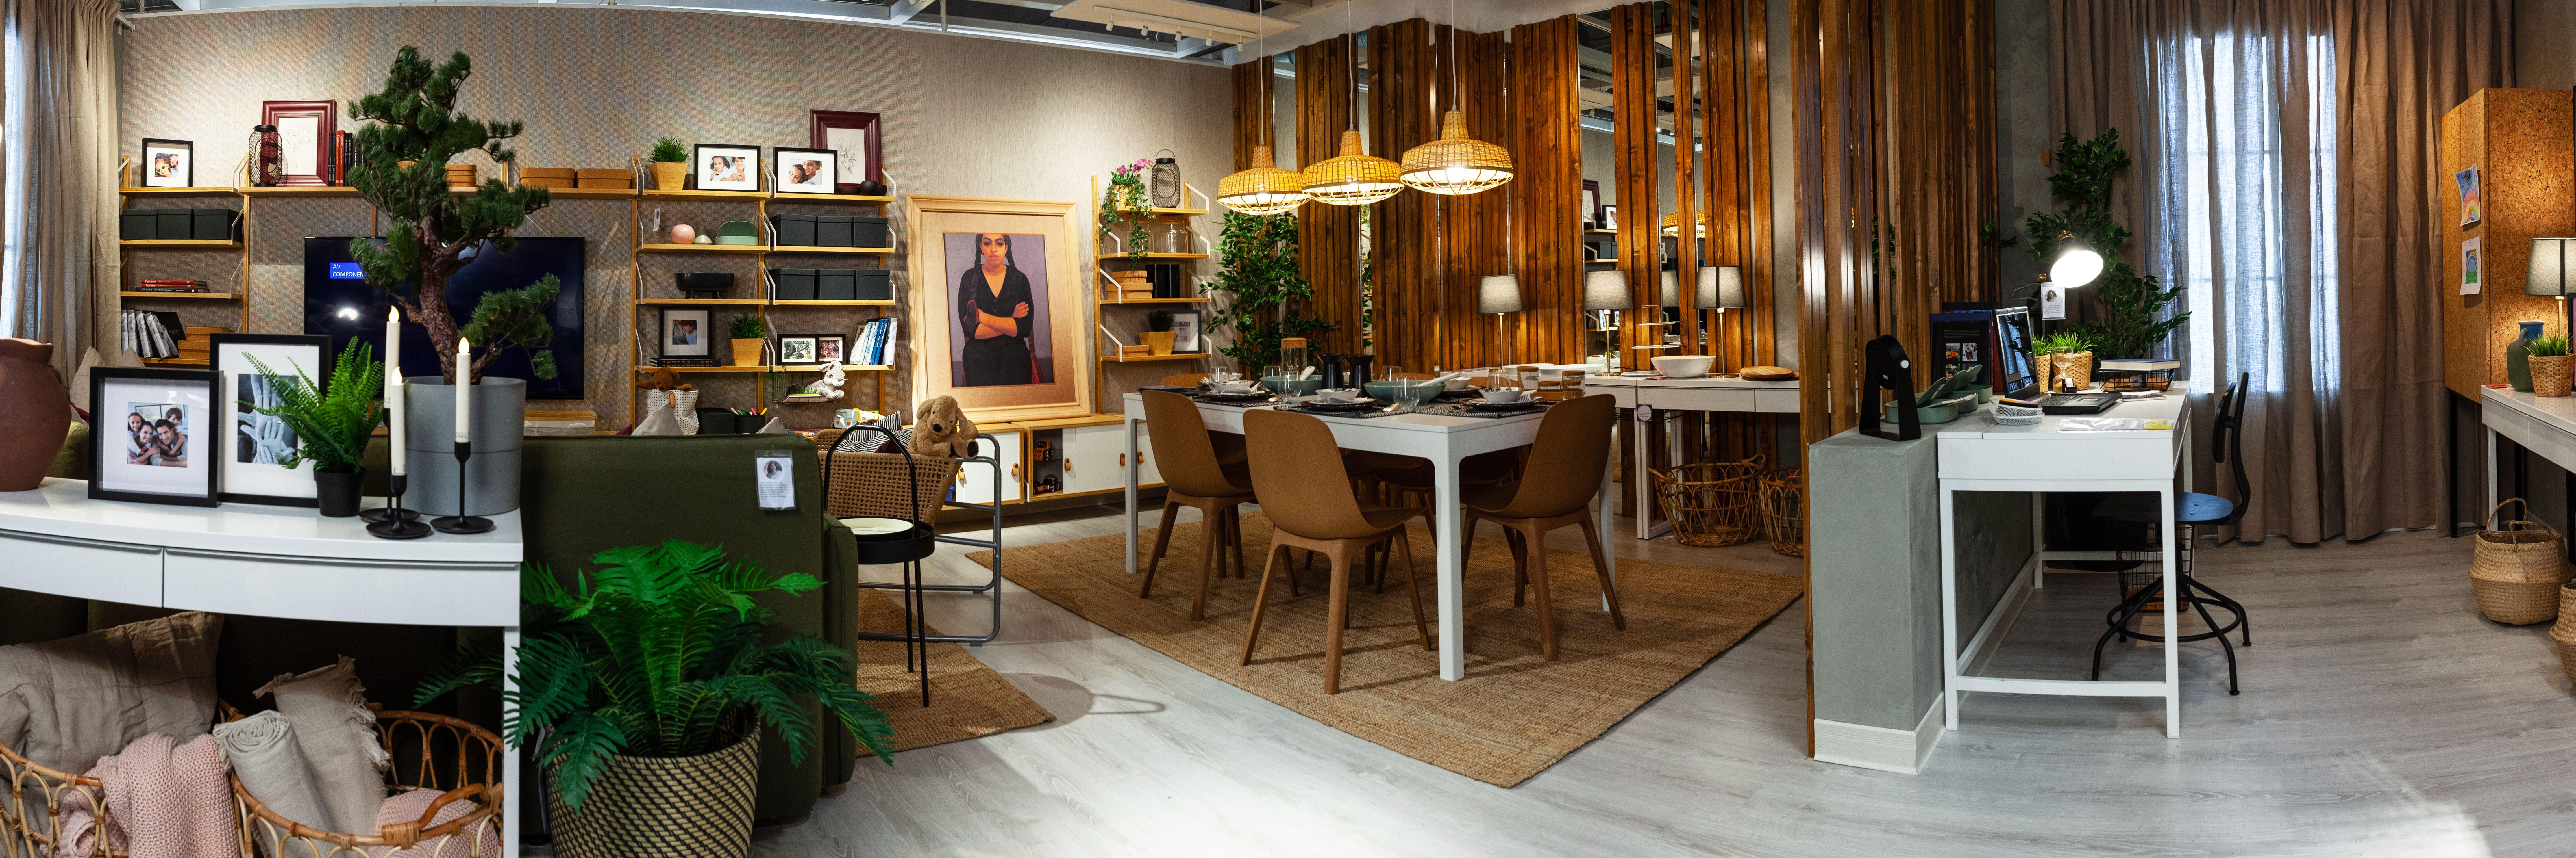 Panorama Full Vision تصوير بانوراما للتصميم كامل Ikea Living Room Design Planning Design